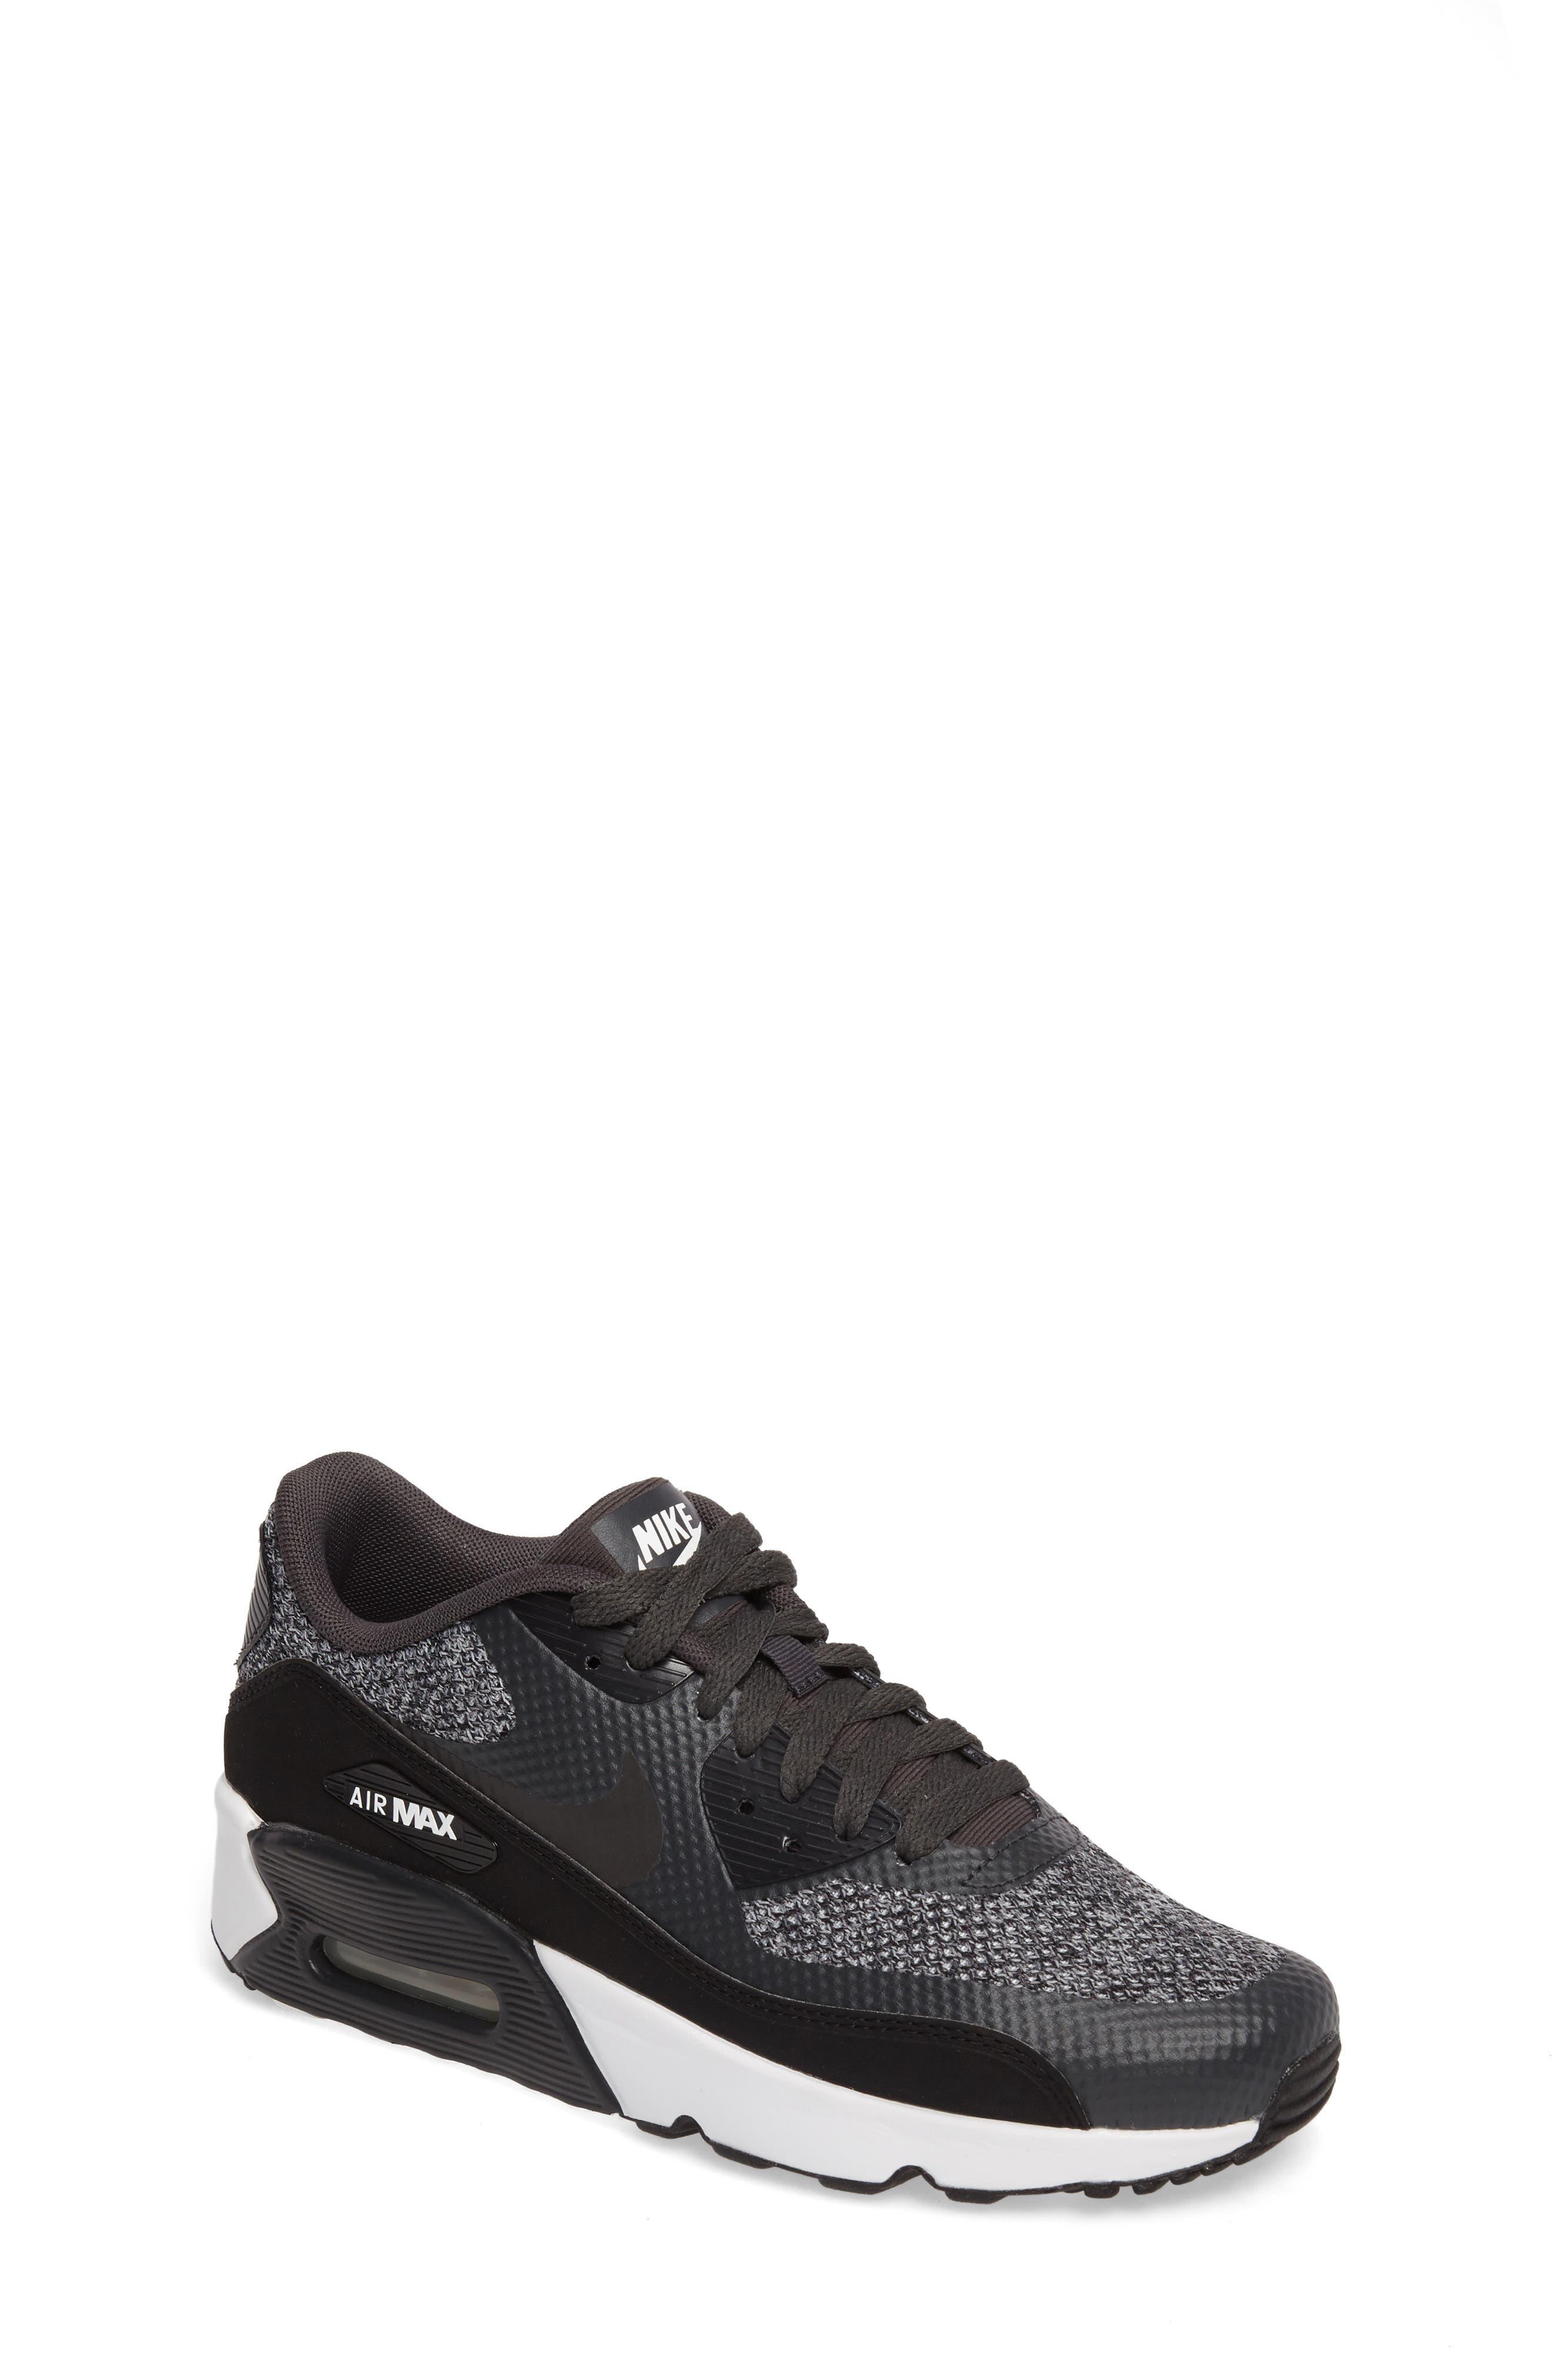 Air Max 90 Ultra 2.0 SE Sneaker,                             Main thumbnail 1, color,                             Anthracite/ Black